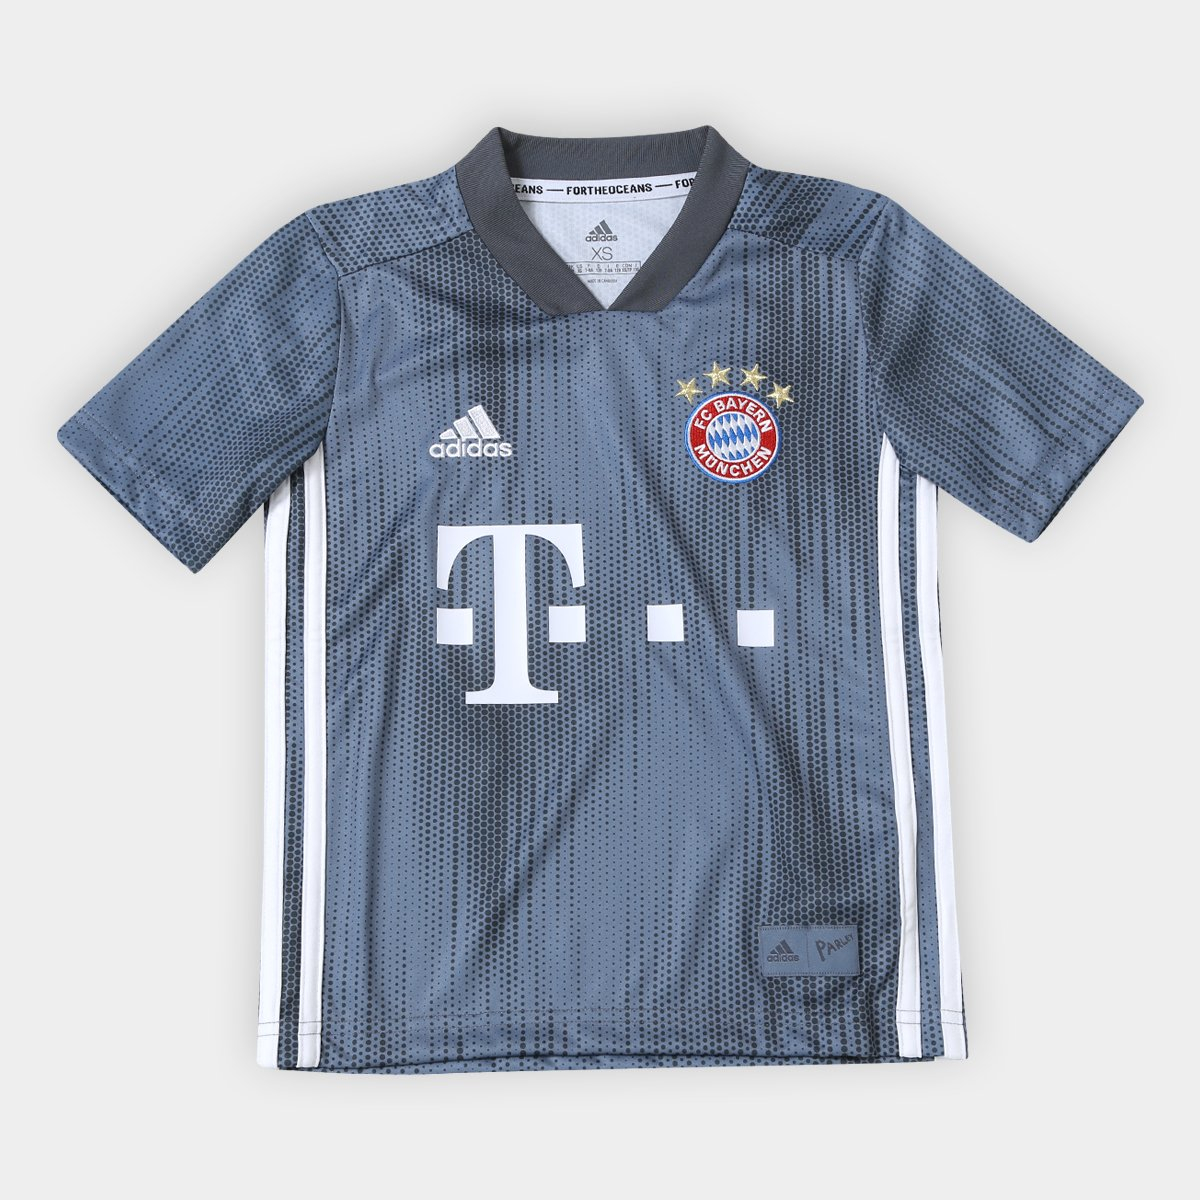 110062c0f9 Camisa Infantil Bayern de Munique Third 2018 s/n° - Torcedor Adidas |  Allianz Parque Shop